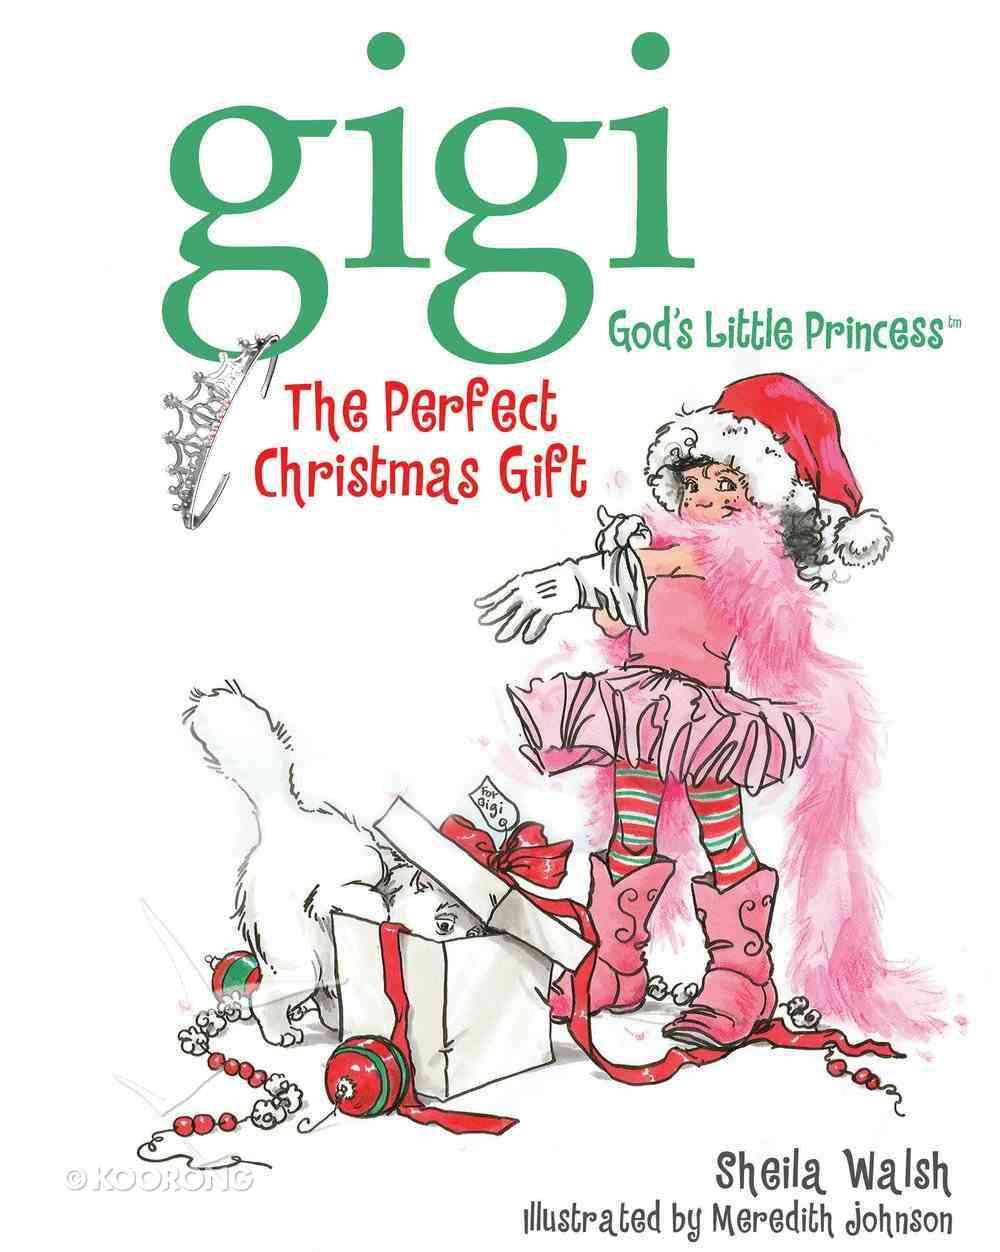 The Perfect Christmas Gift (Gigi, God's Little Princess Series) eBook